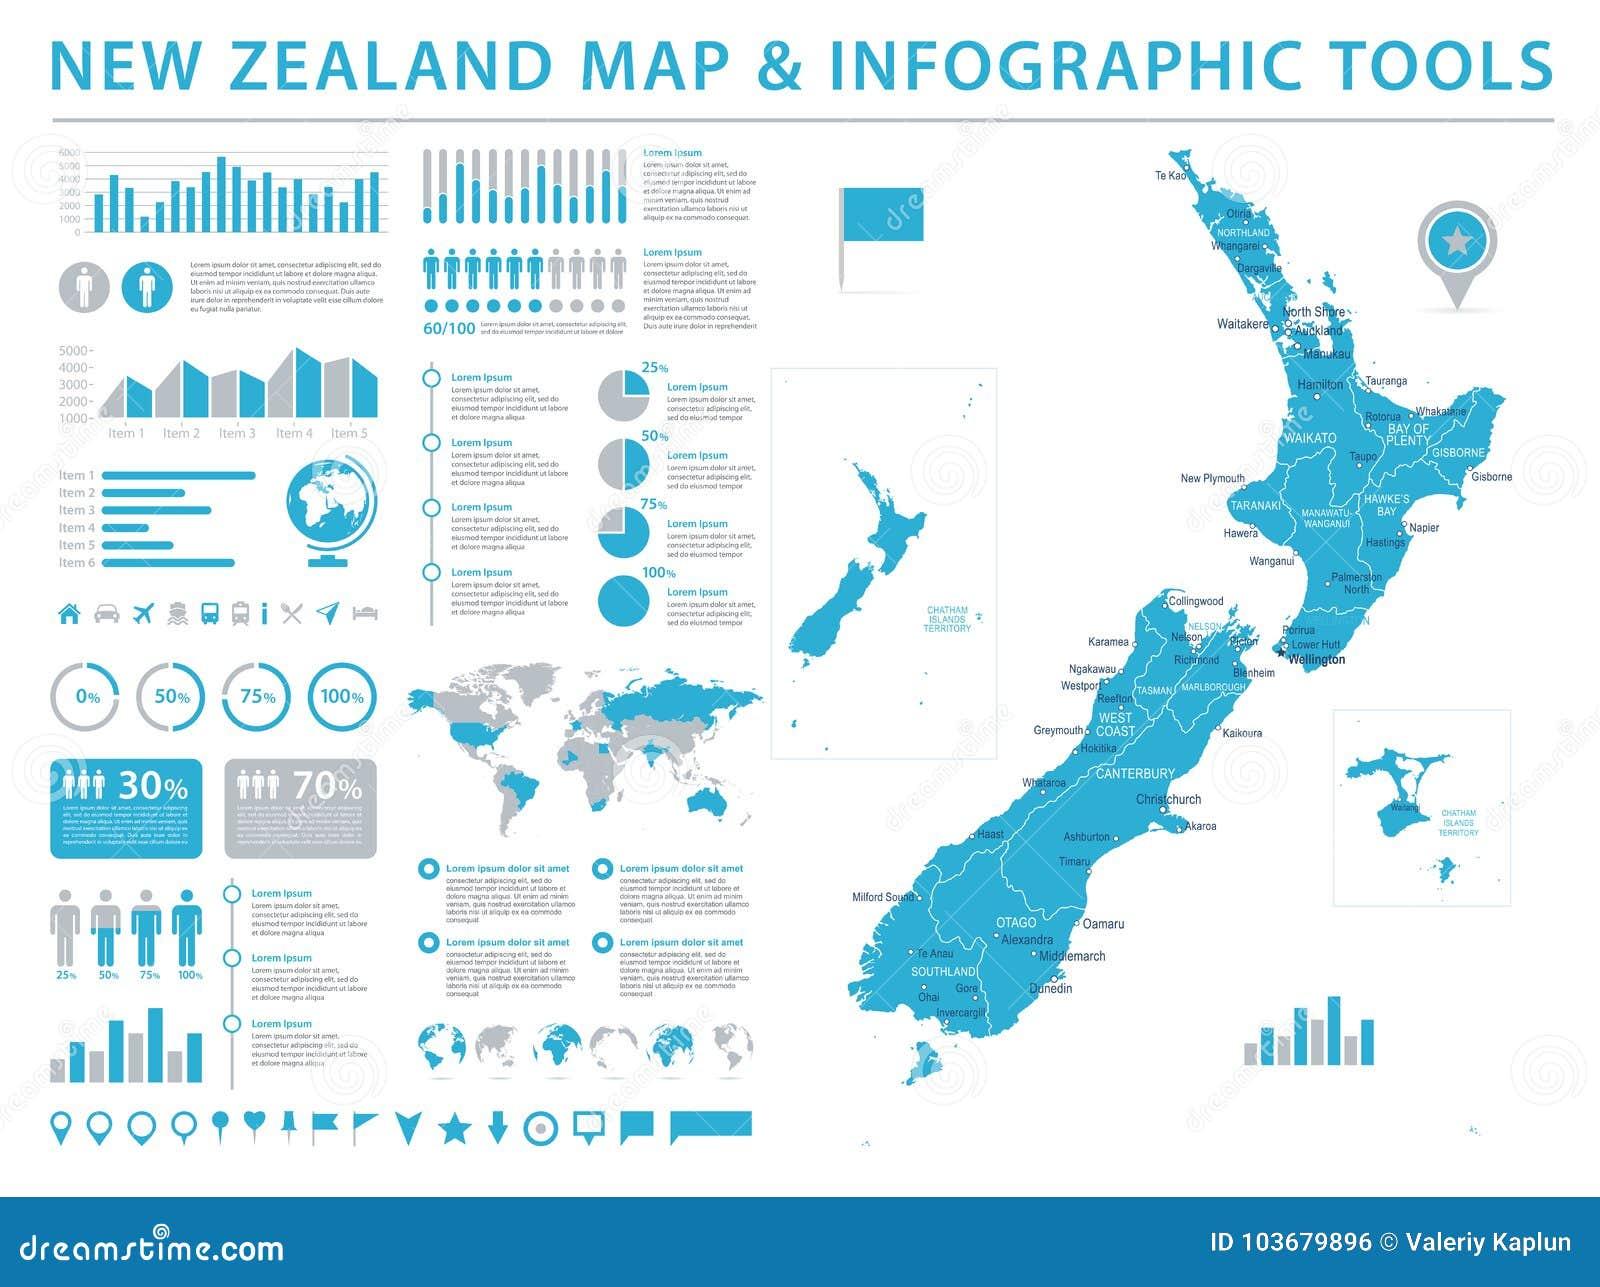 New Zealand Wellington Map.New Zealand Map Info Graphic Vector Illustration Stock